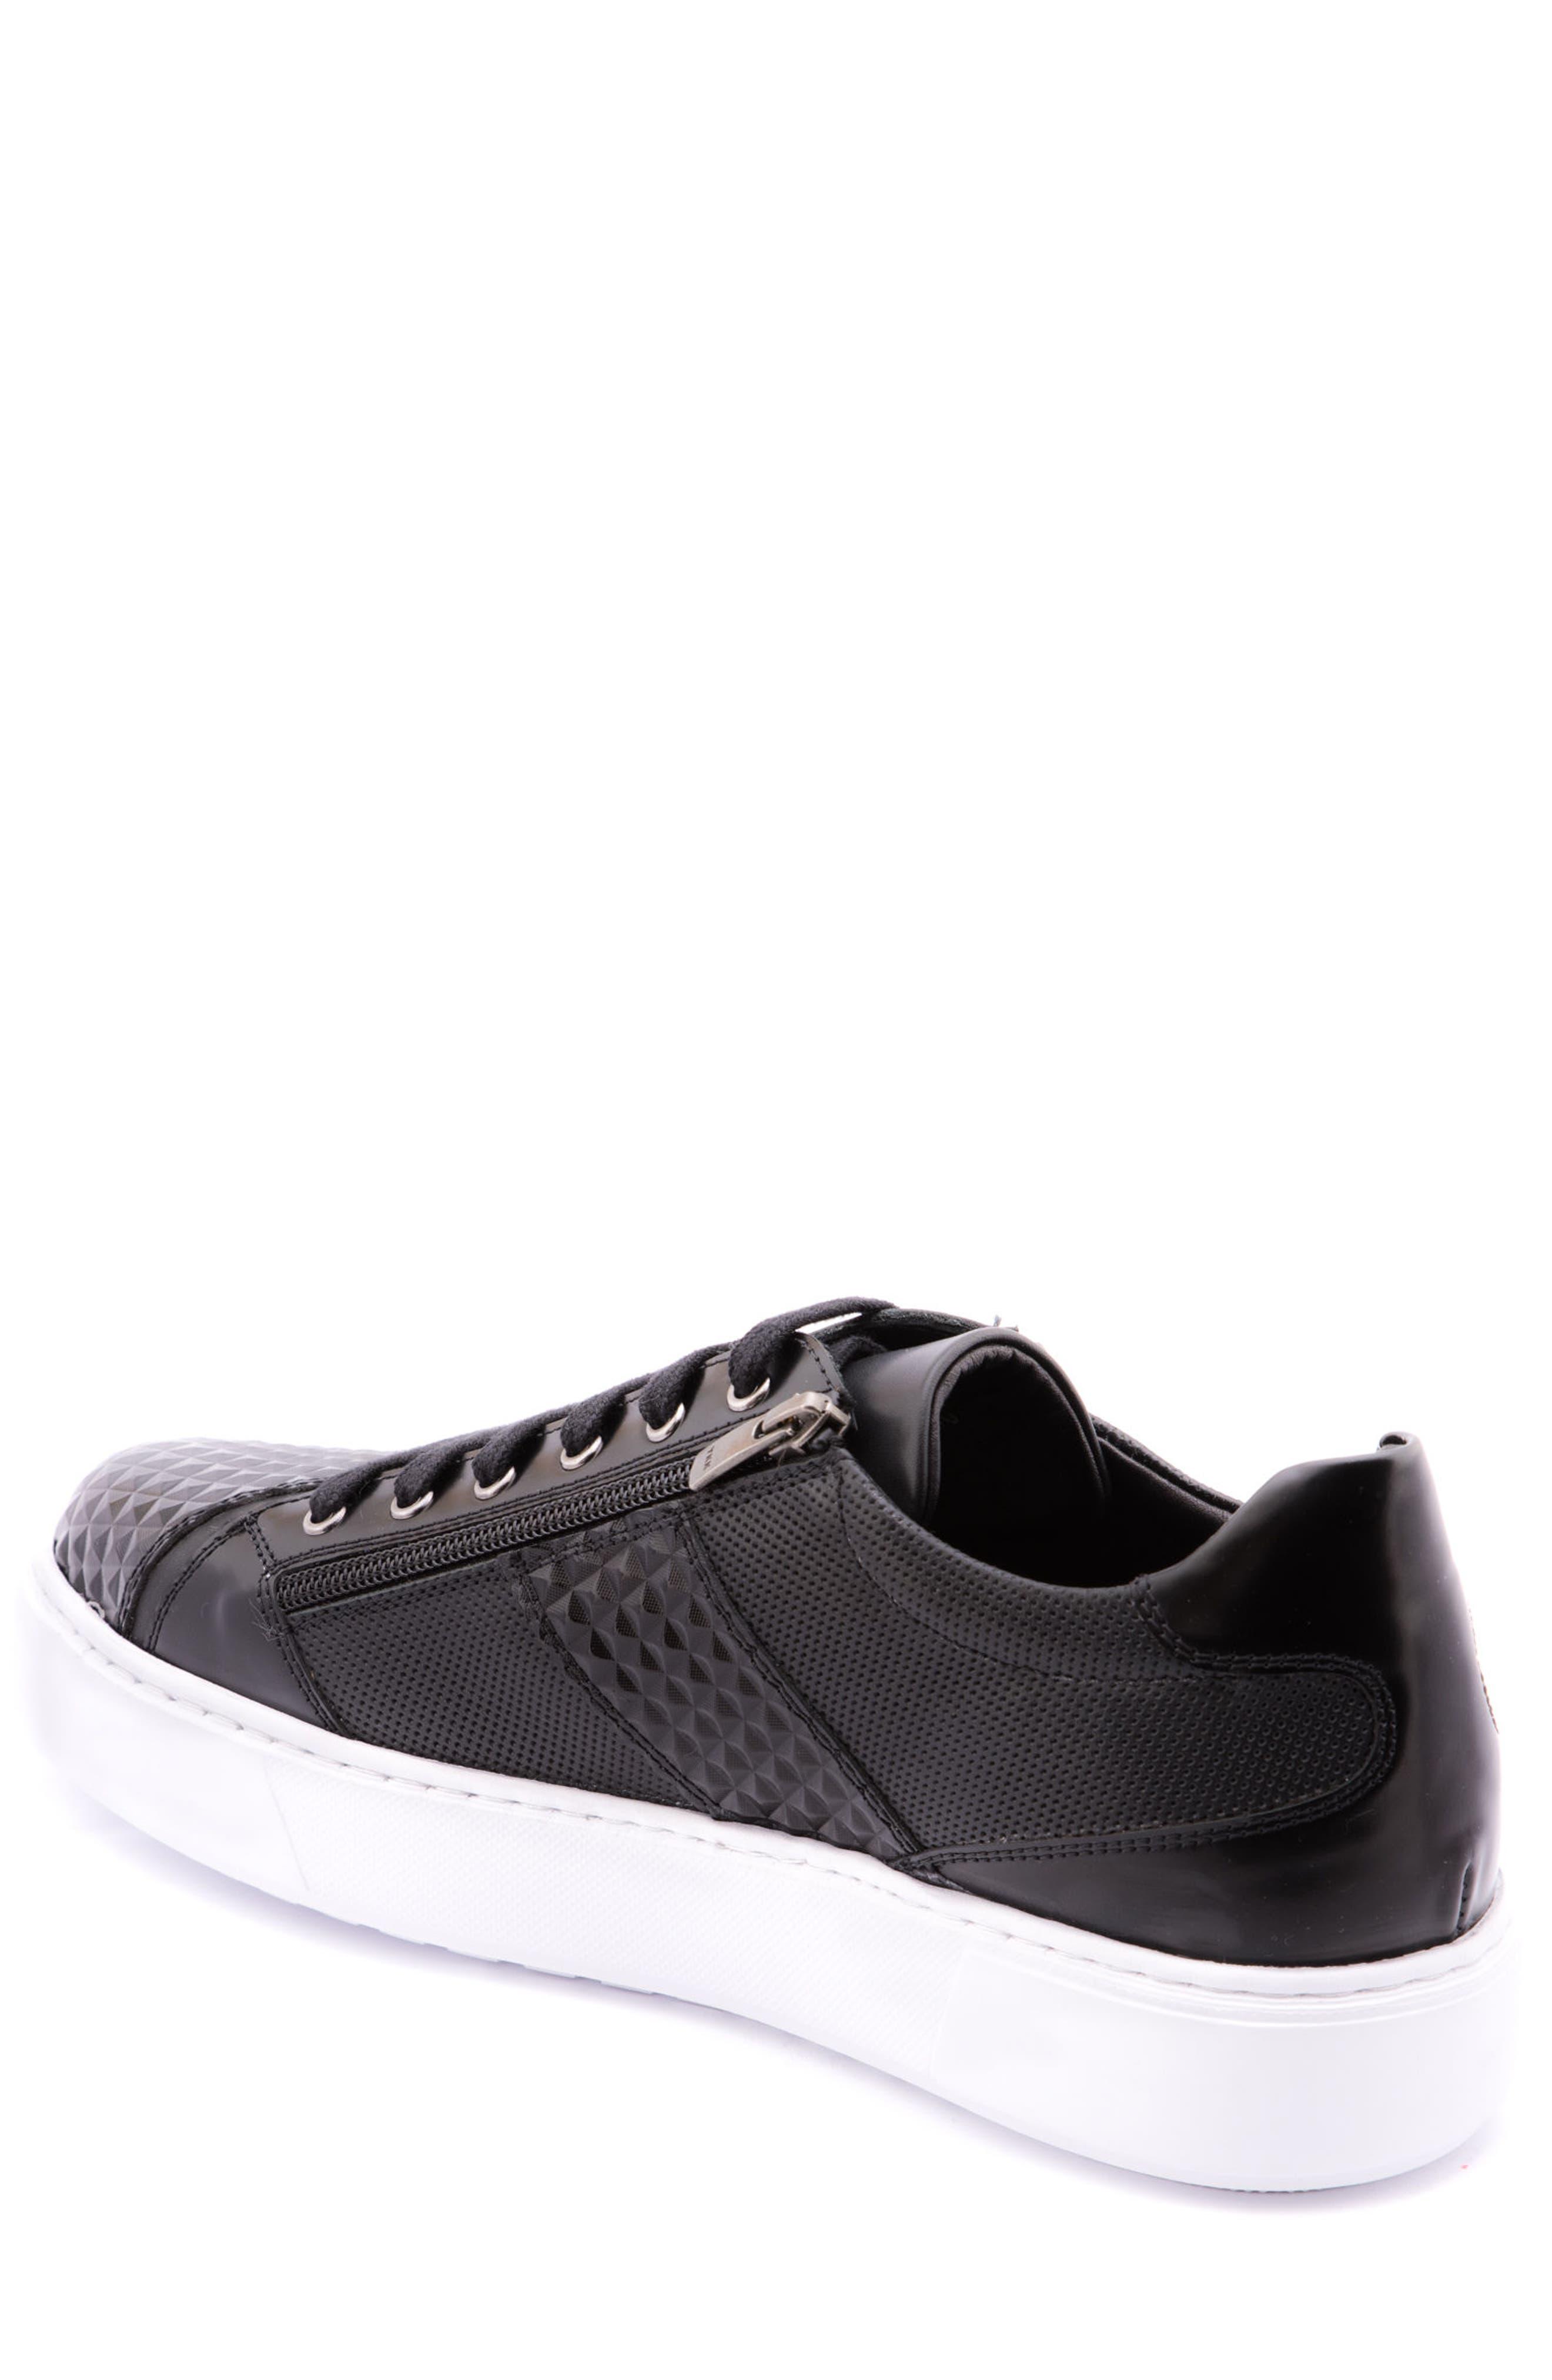 Justin Perforated Sneaker,                             Alternate thumbnail 2, color,                             Black